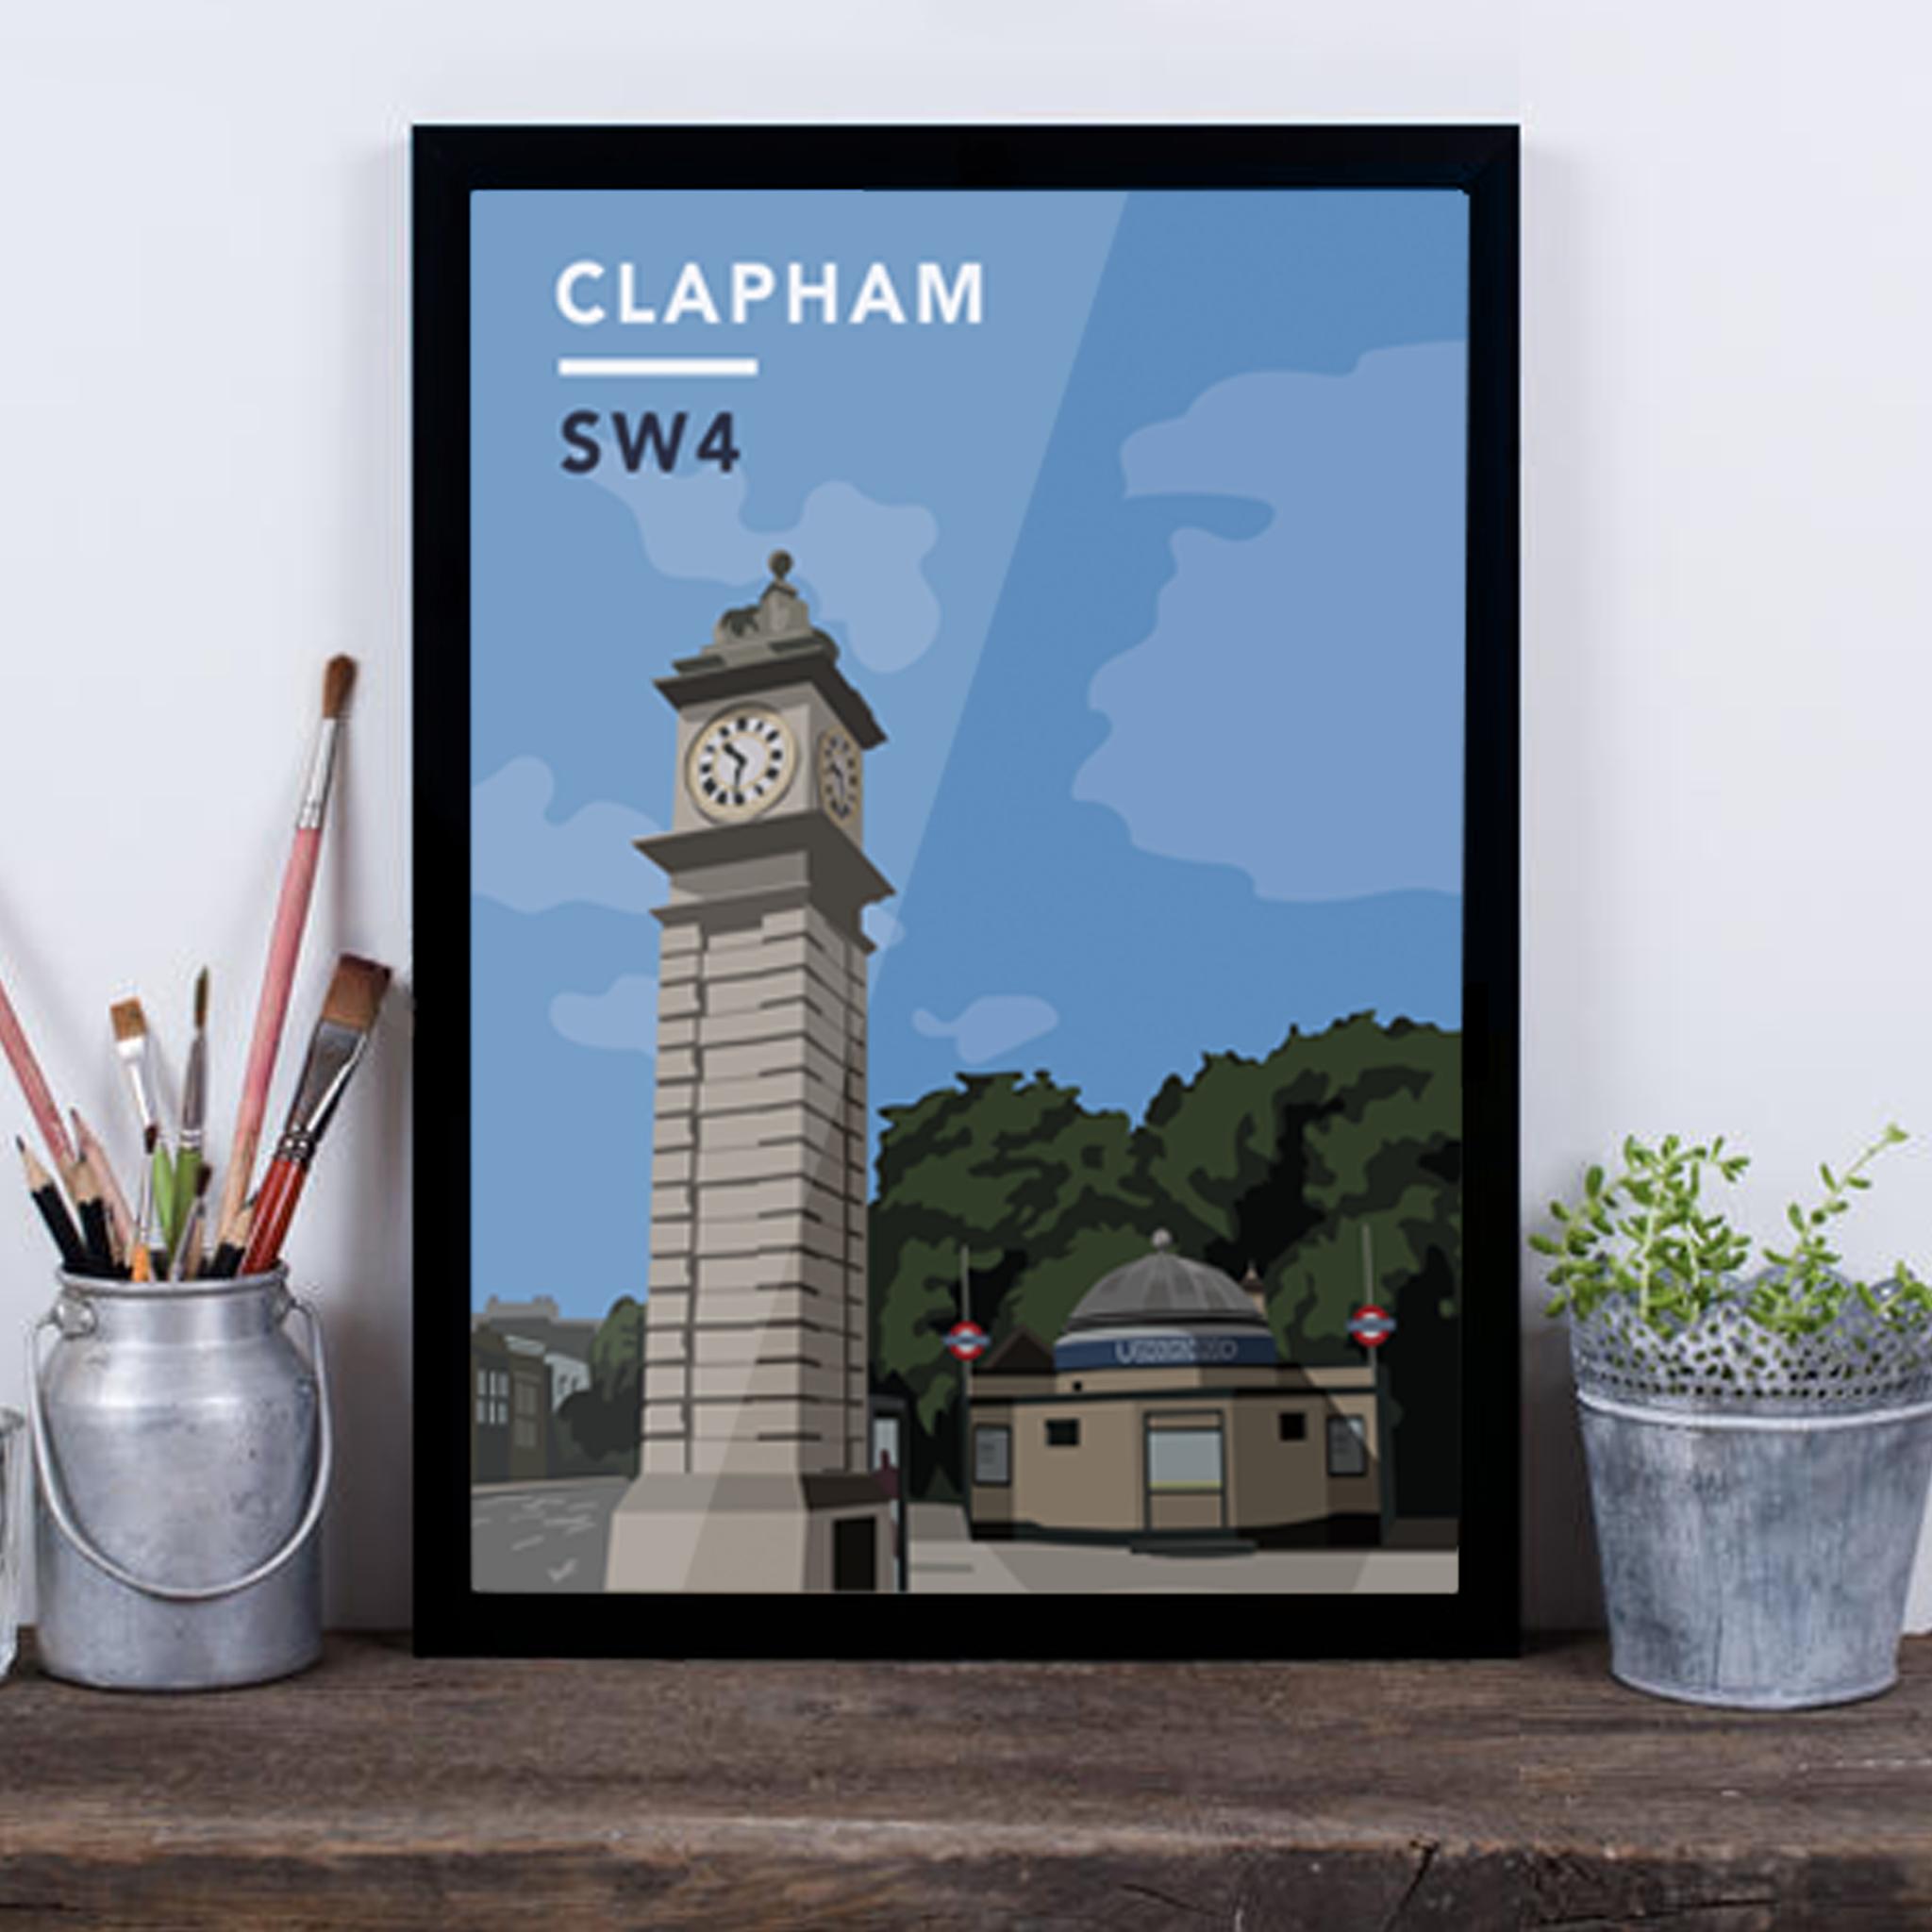 Clapham Clock Tower And Underground Station SW4 - Giclée Art Print -